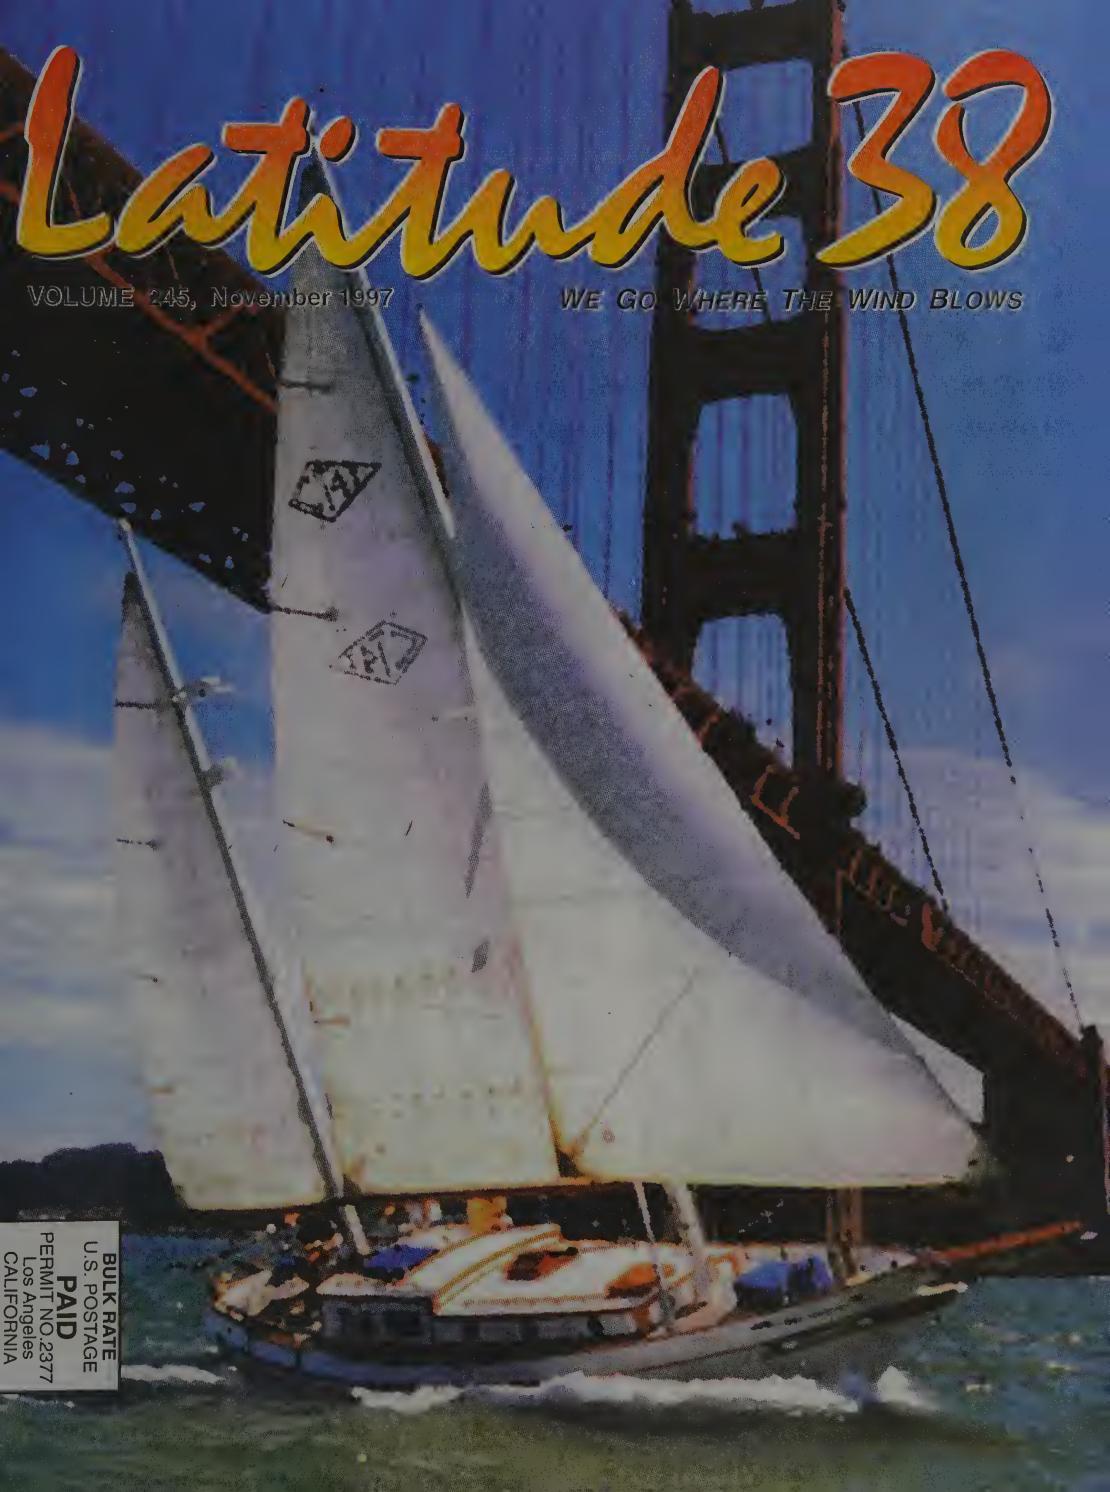 Java uc browser 9.5 download.java wara net. Latitude 38 November 1997 By Latitude 38 Media Llc Issuu